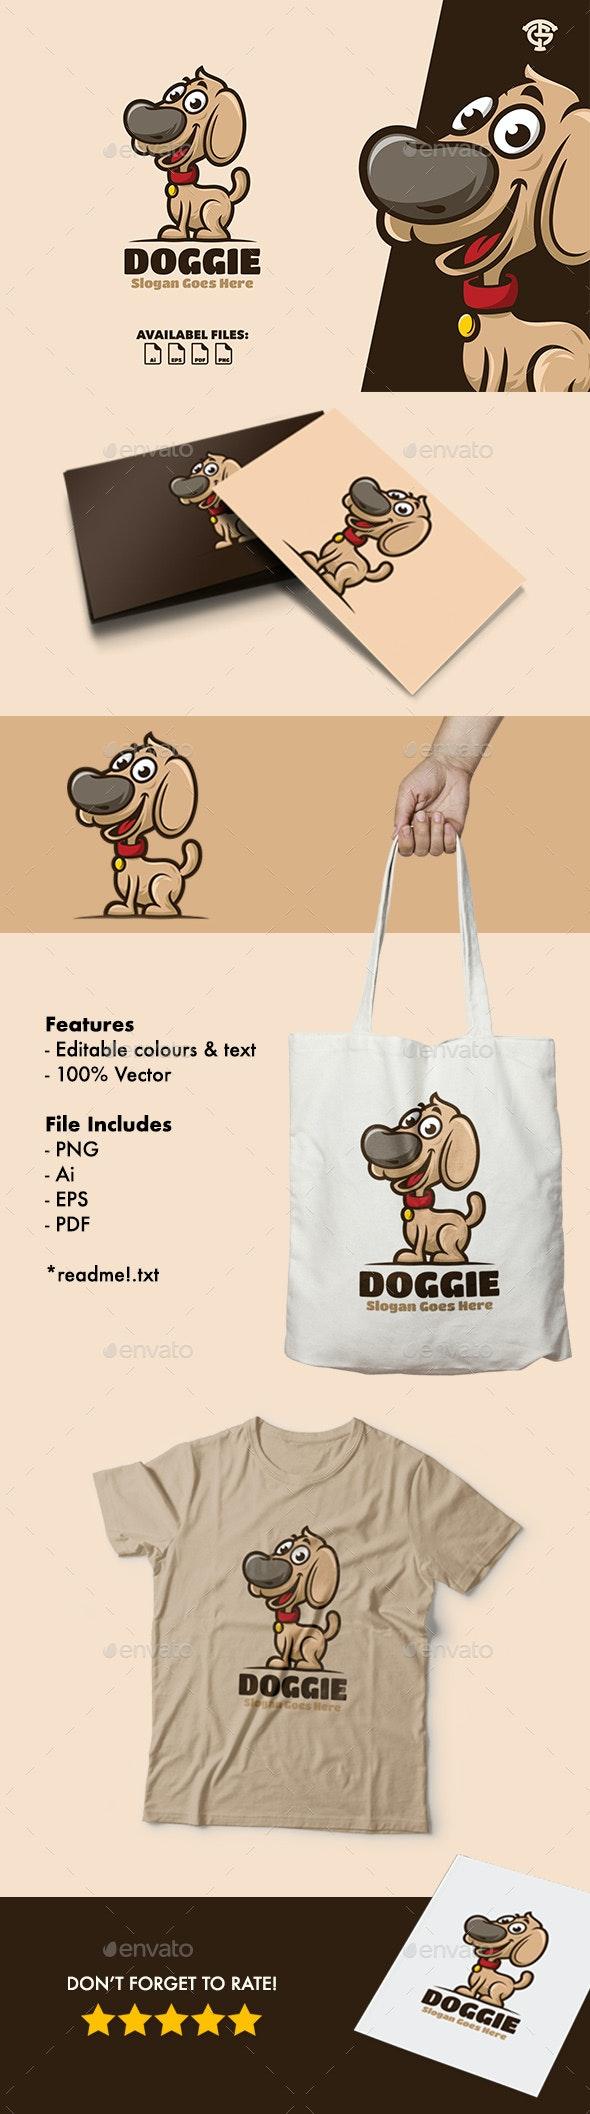 Doggie - Logo Mascot - Animals Logo Templates